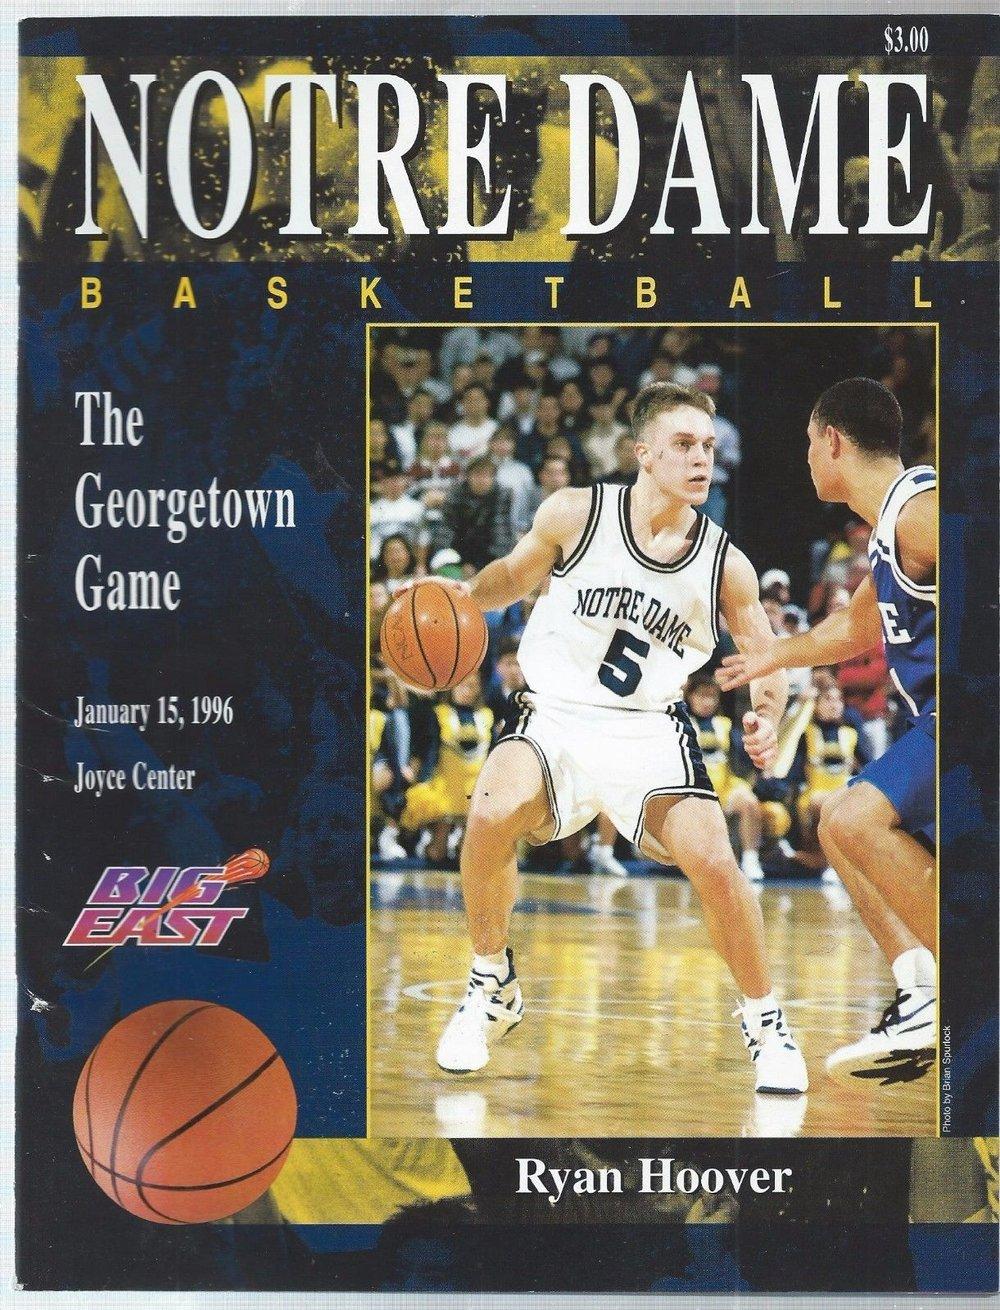 `1995-96 Notre Dame Fighting Irish program.